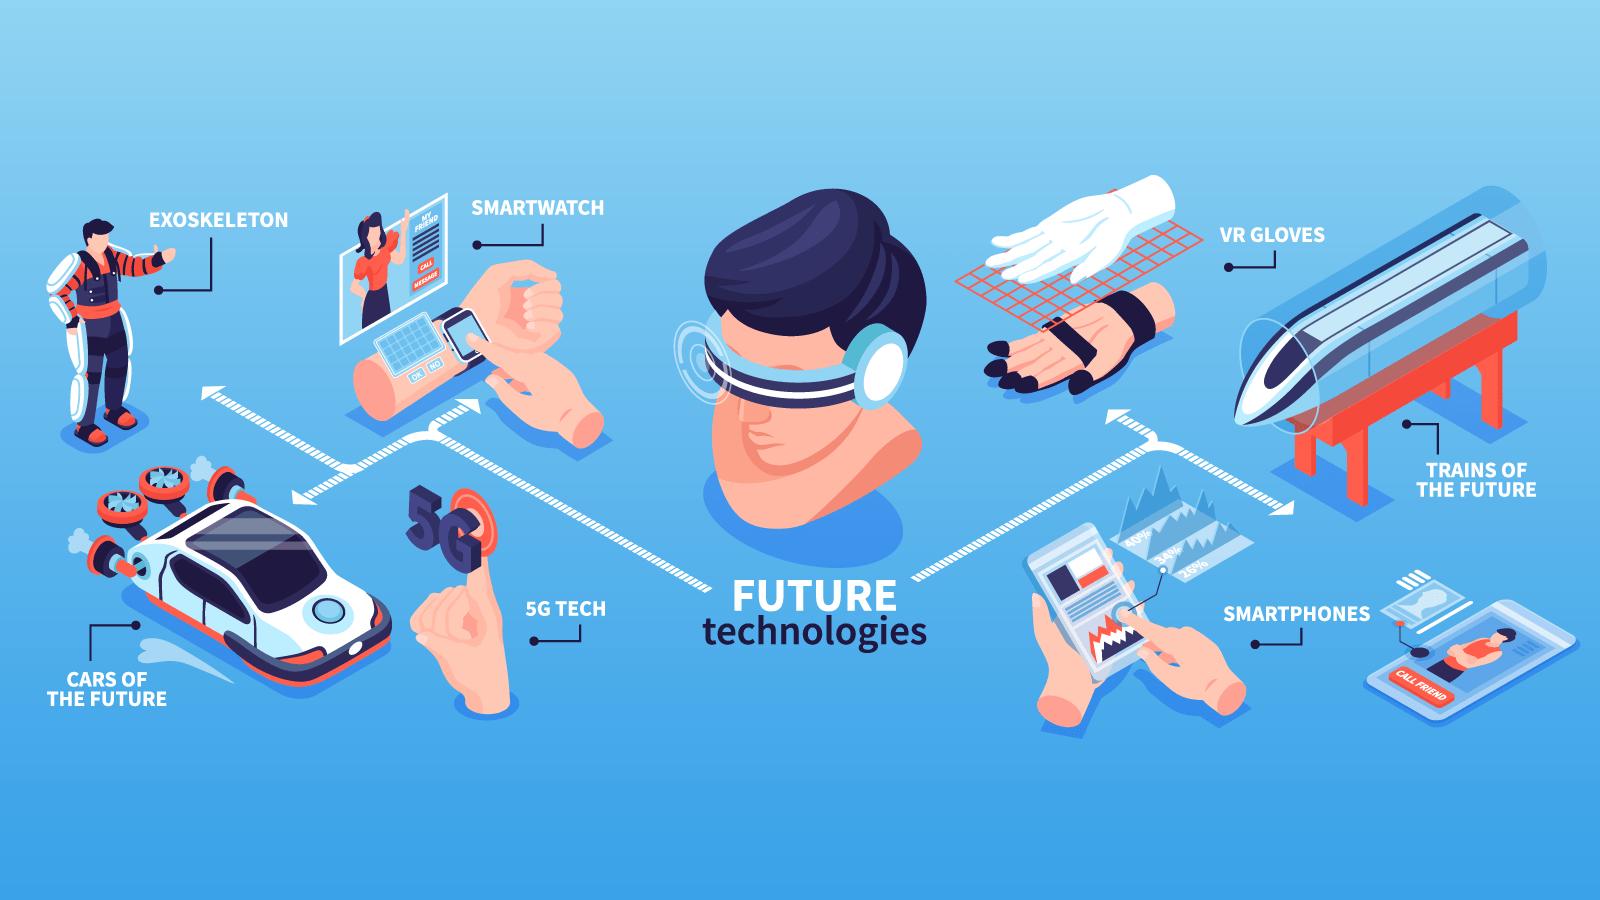 technology-driven innovation